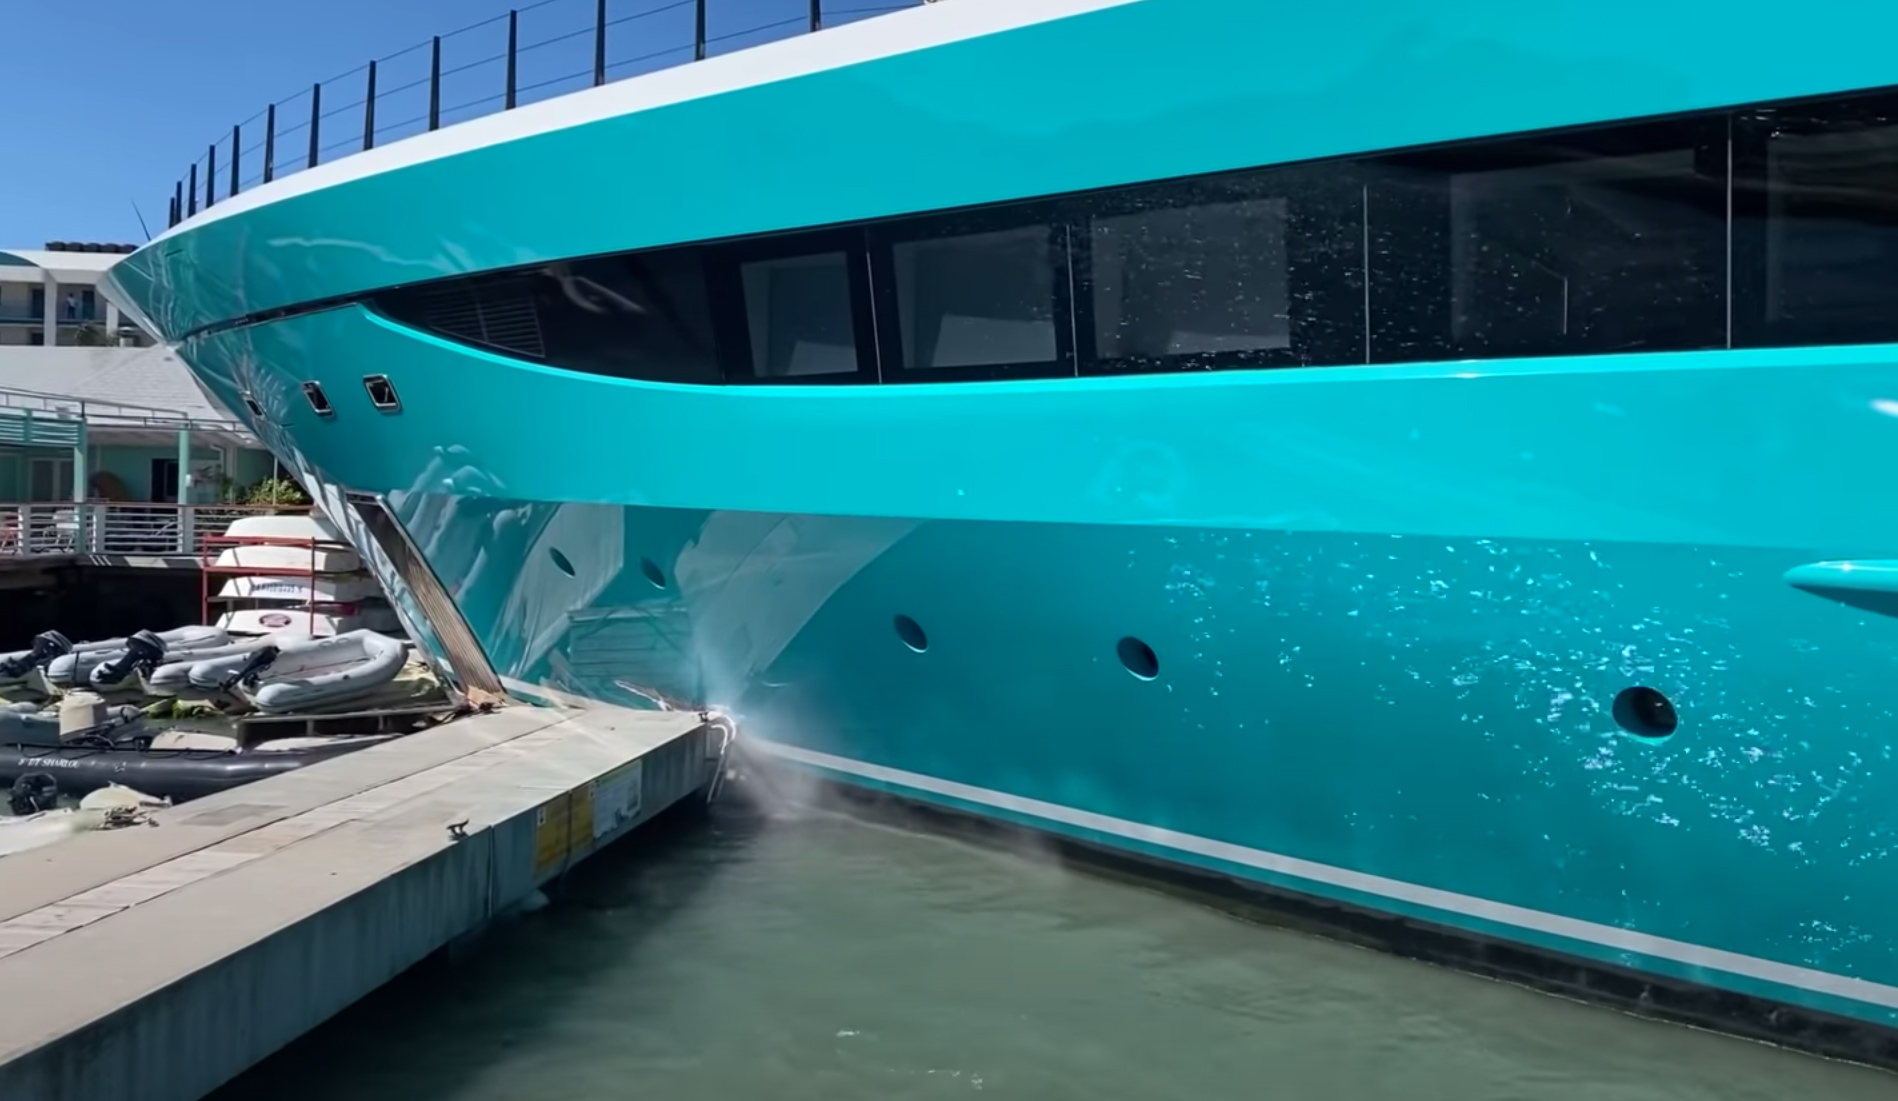 Superyacht crash video shows 77m Go colliding with Caribbean dock